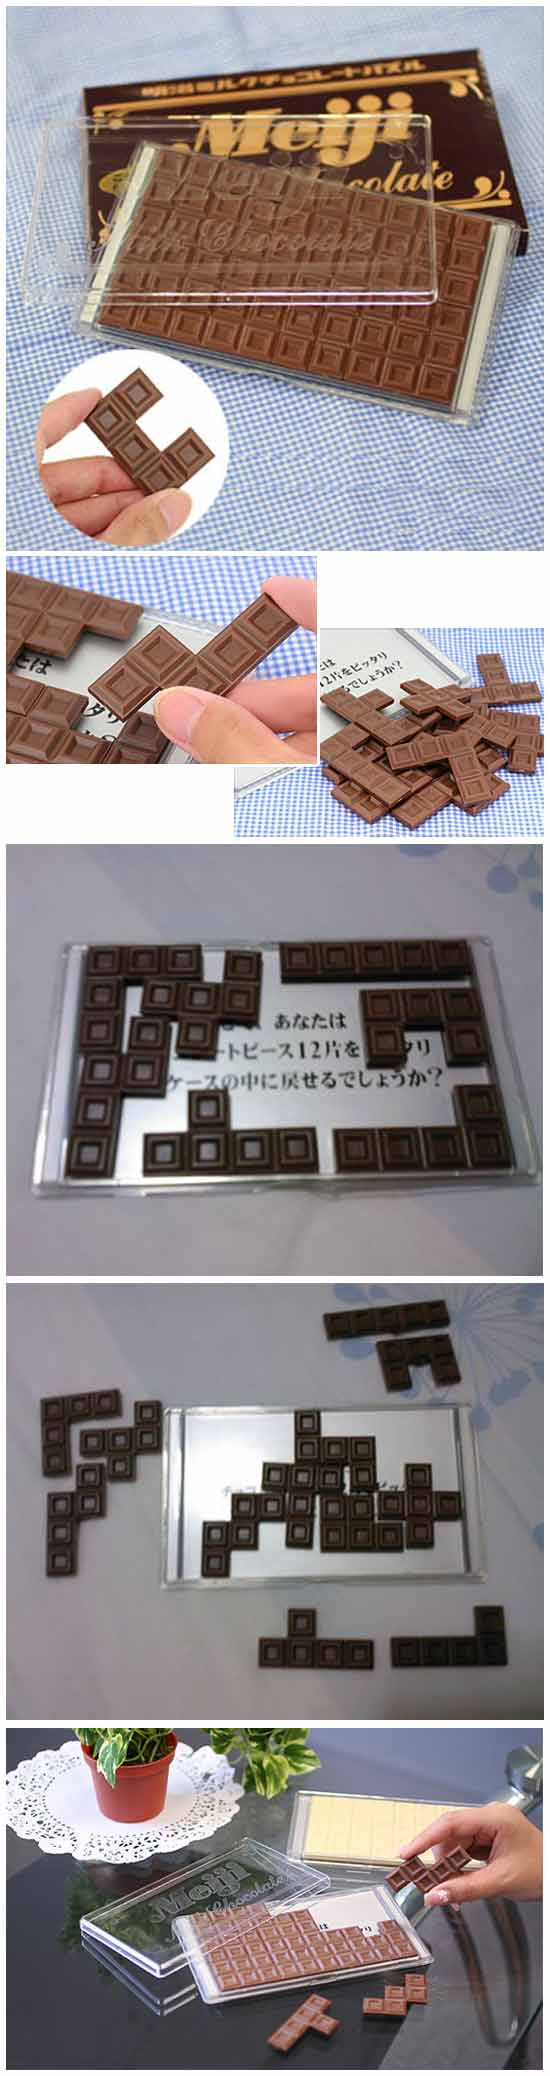 Шоколадные пазлы